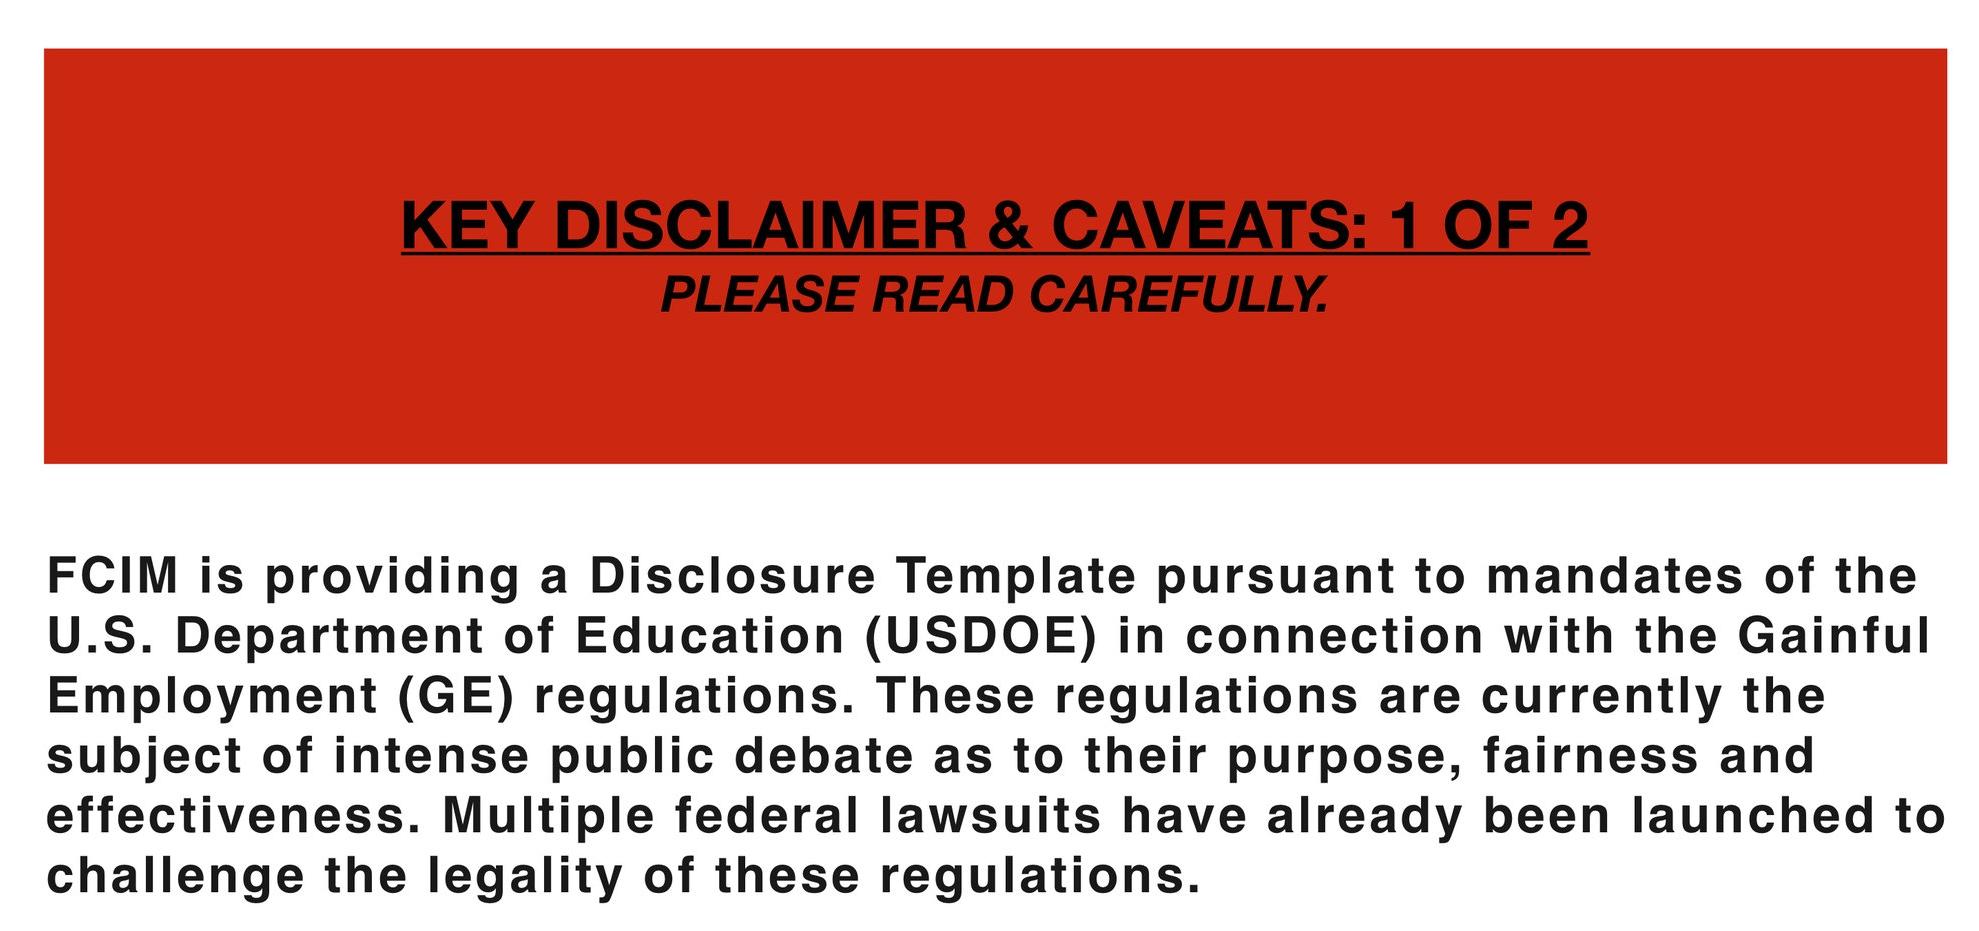 GE Disclaimer & caveats 1 of 2 5.21.18.jpg